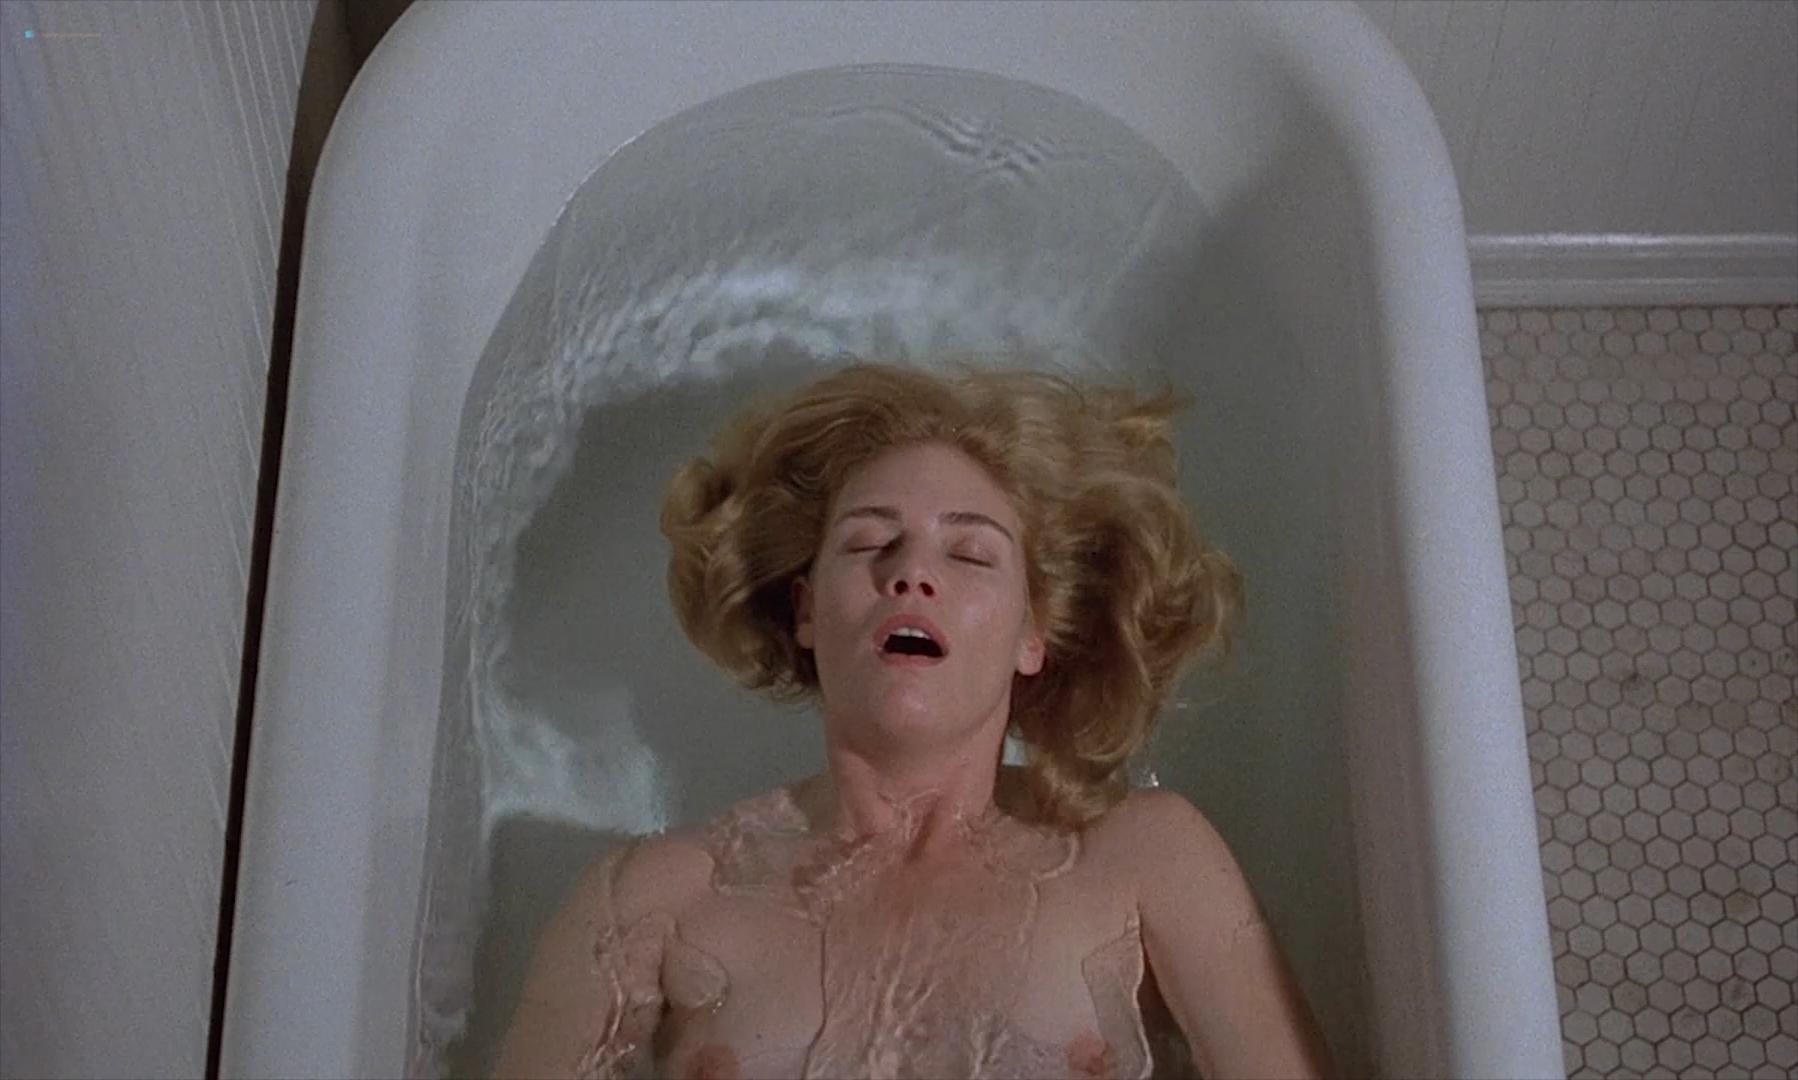 Anastacia mcpherson nude house of lies scandalplanetcom - 1 3